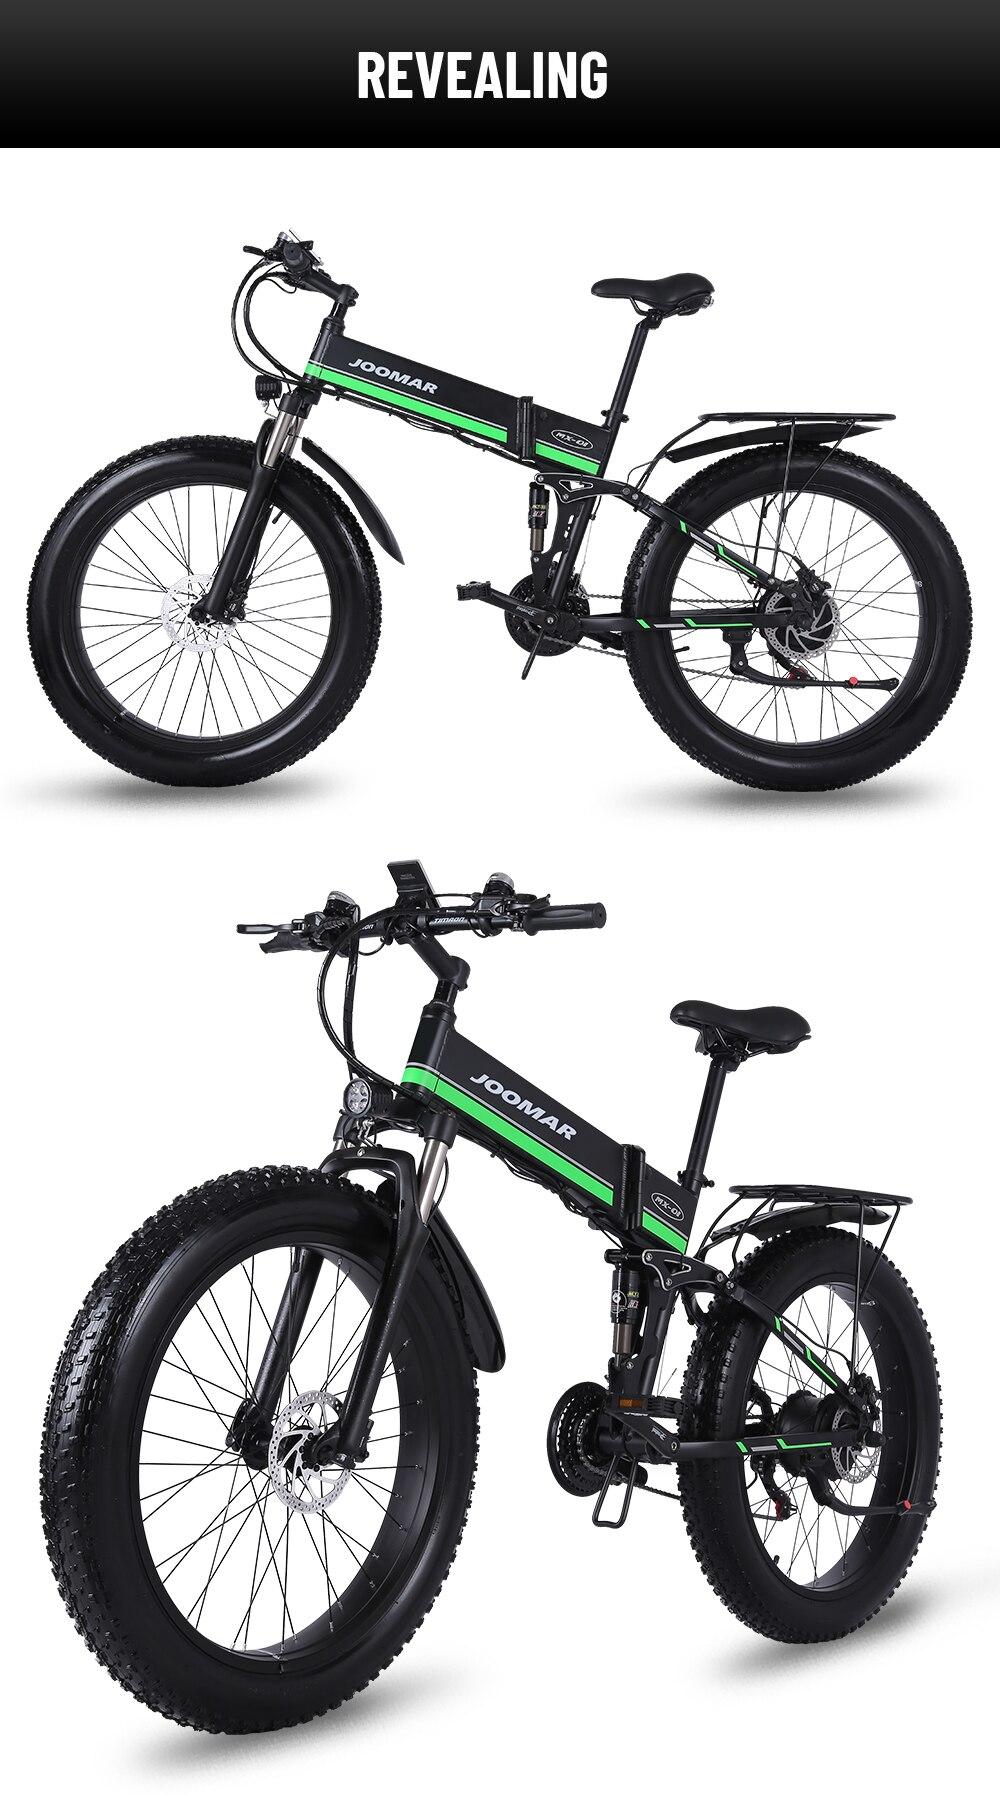 JOOMAR 1000W Electric Bike JM01 Plus 48V Motor for Men Folding Ebike High Quality Aluminum Alloy Fat Tire MTB Snow Bike Ebicycle